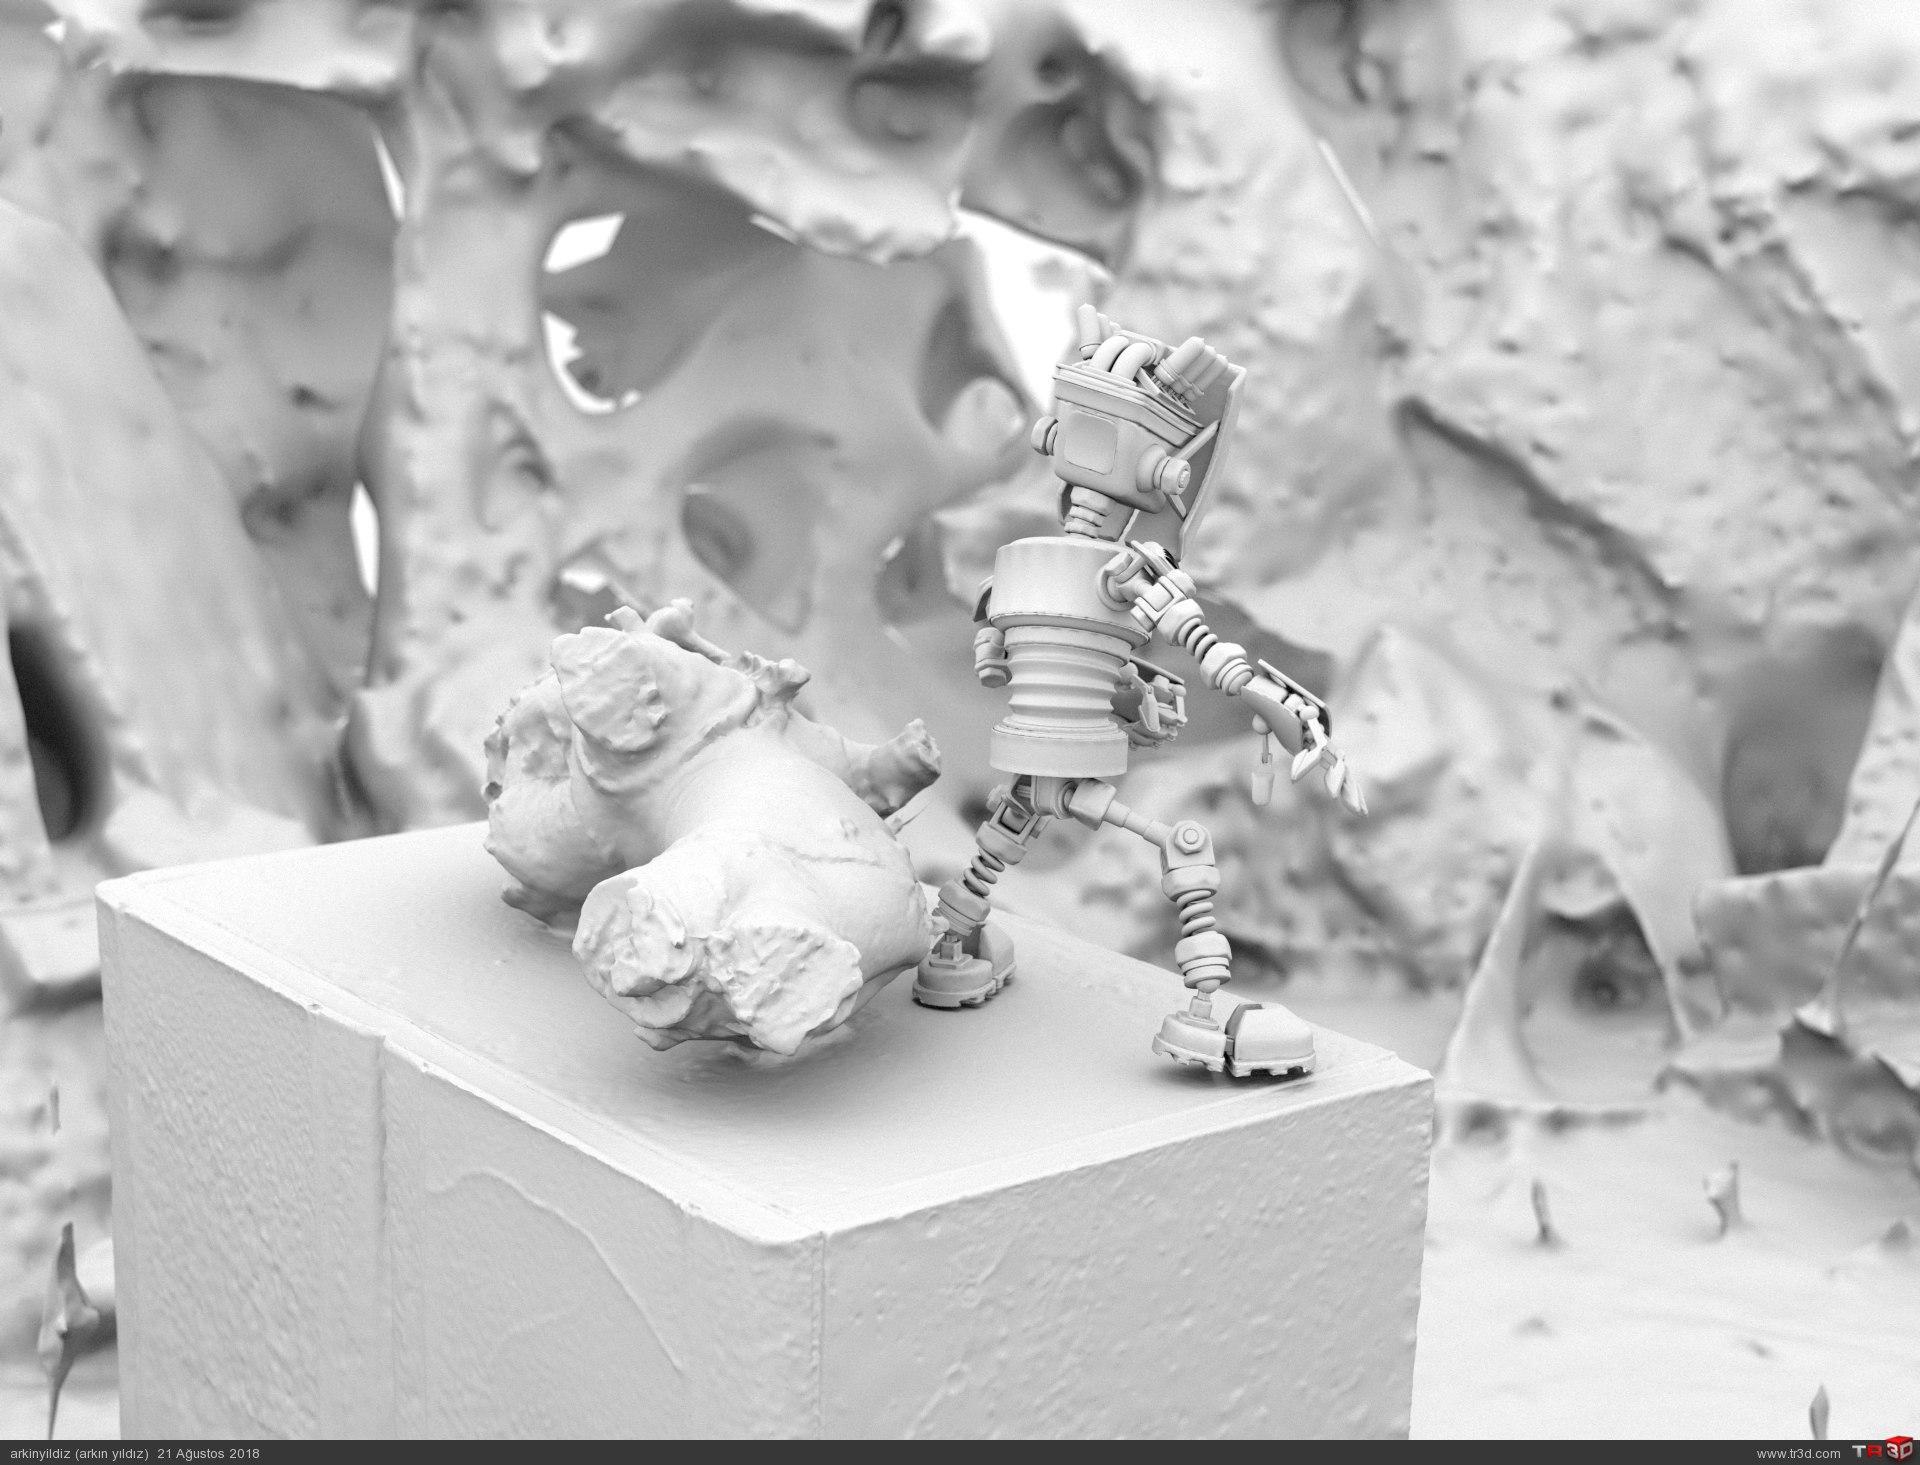 3D Scan Environment & 3D Robot Animation Test 4